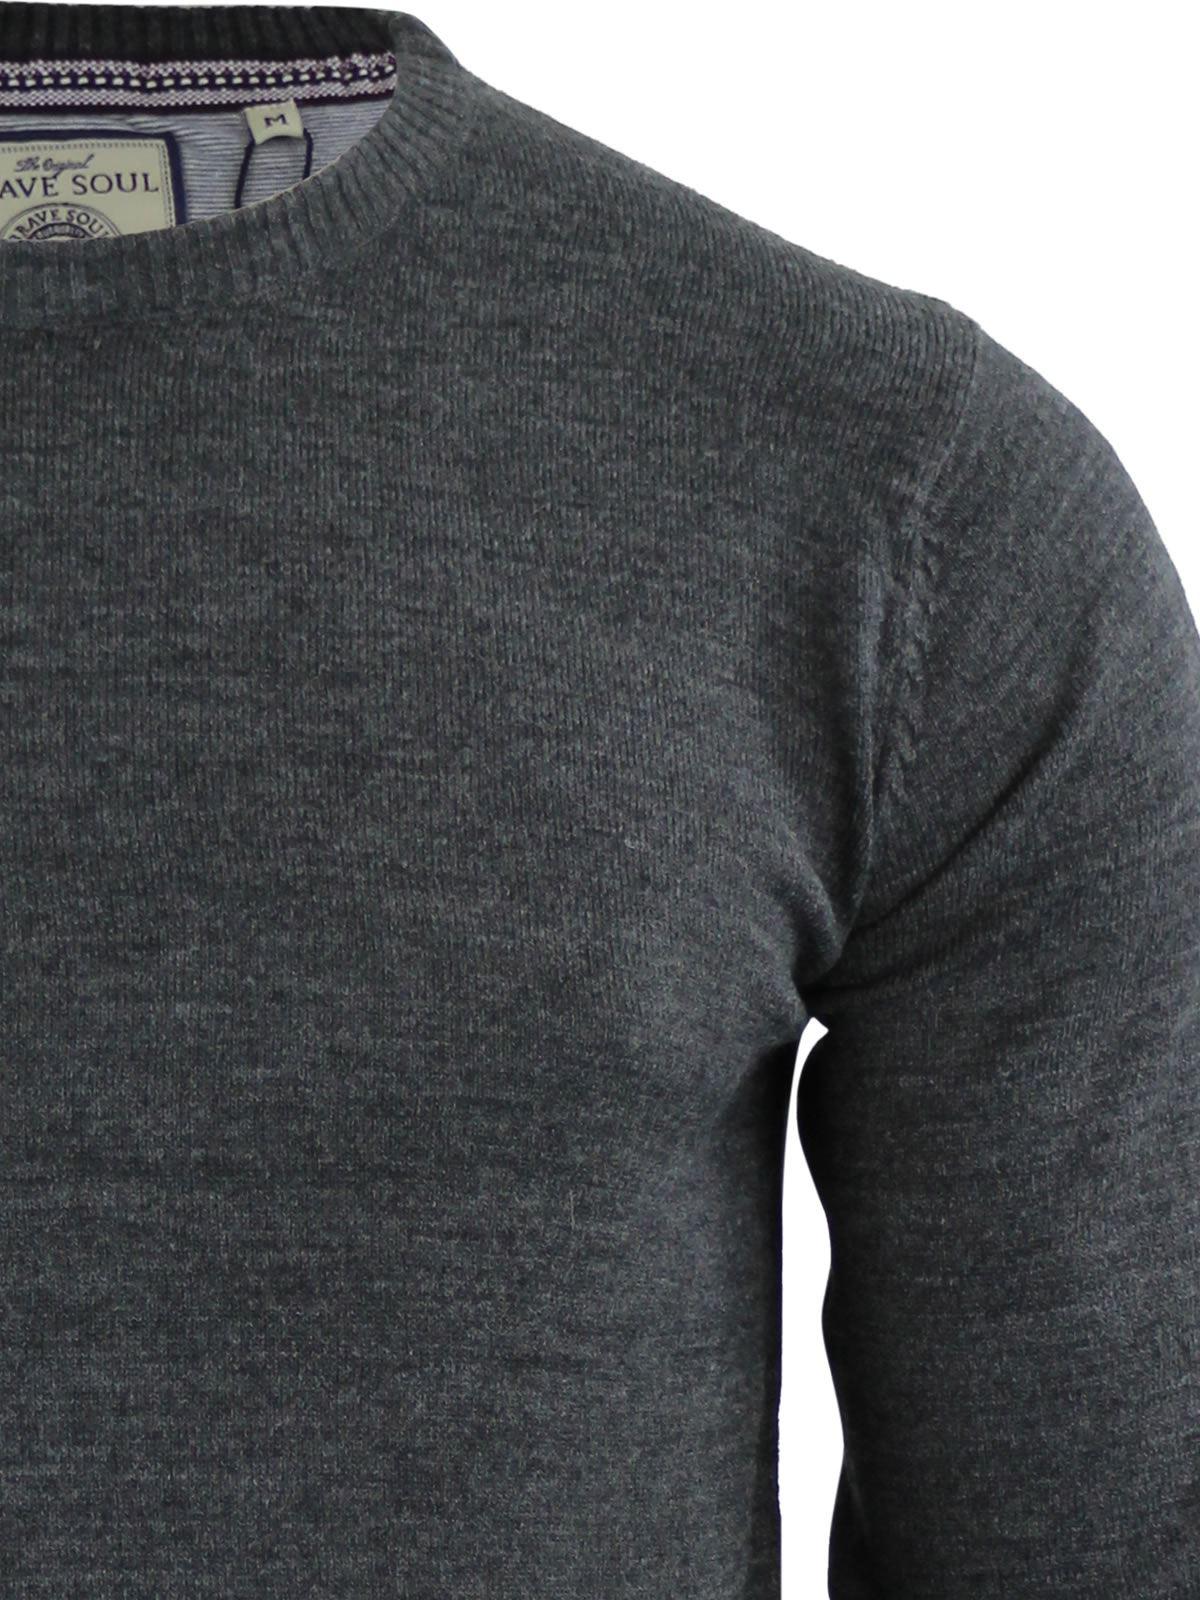 Brave-Soul-Urbain-Mens-Jumper-Knitted-Crew-Neck-Sweater thumbnail 35